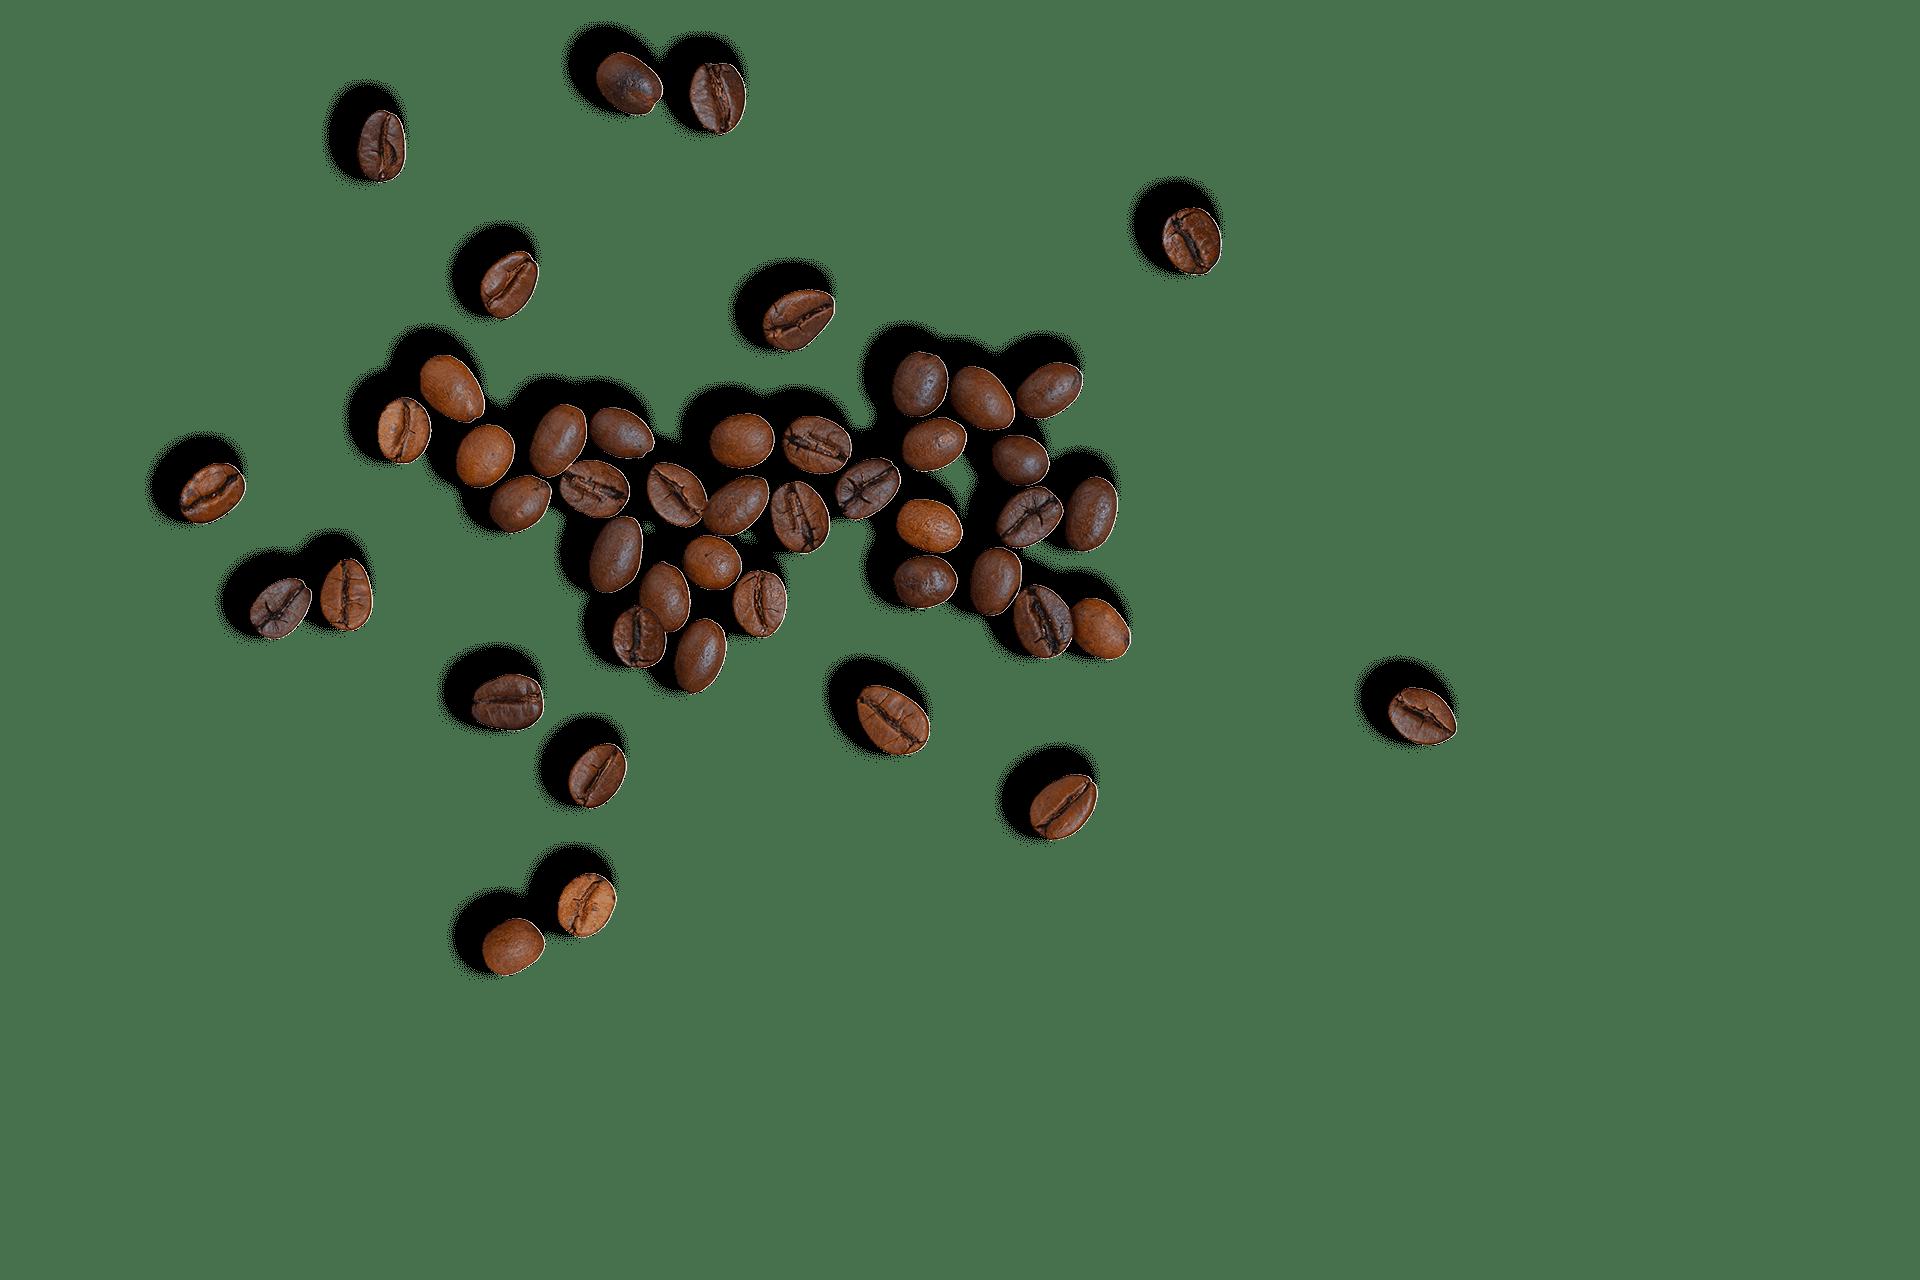 coffeebean image